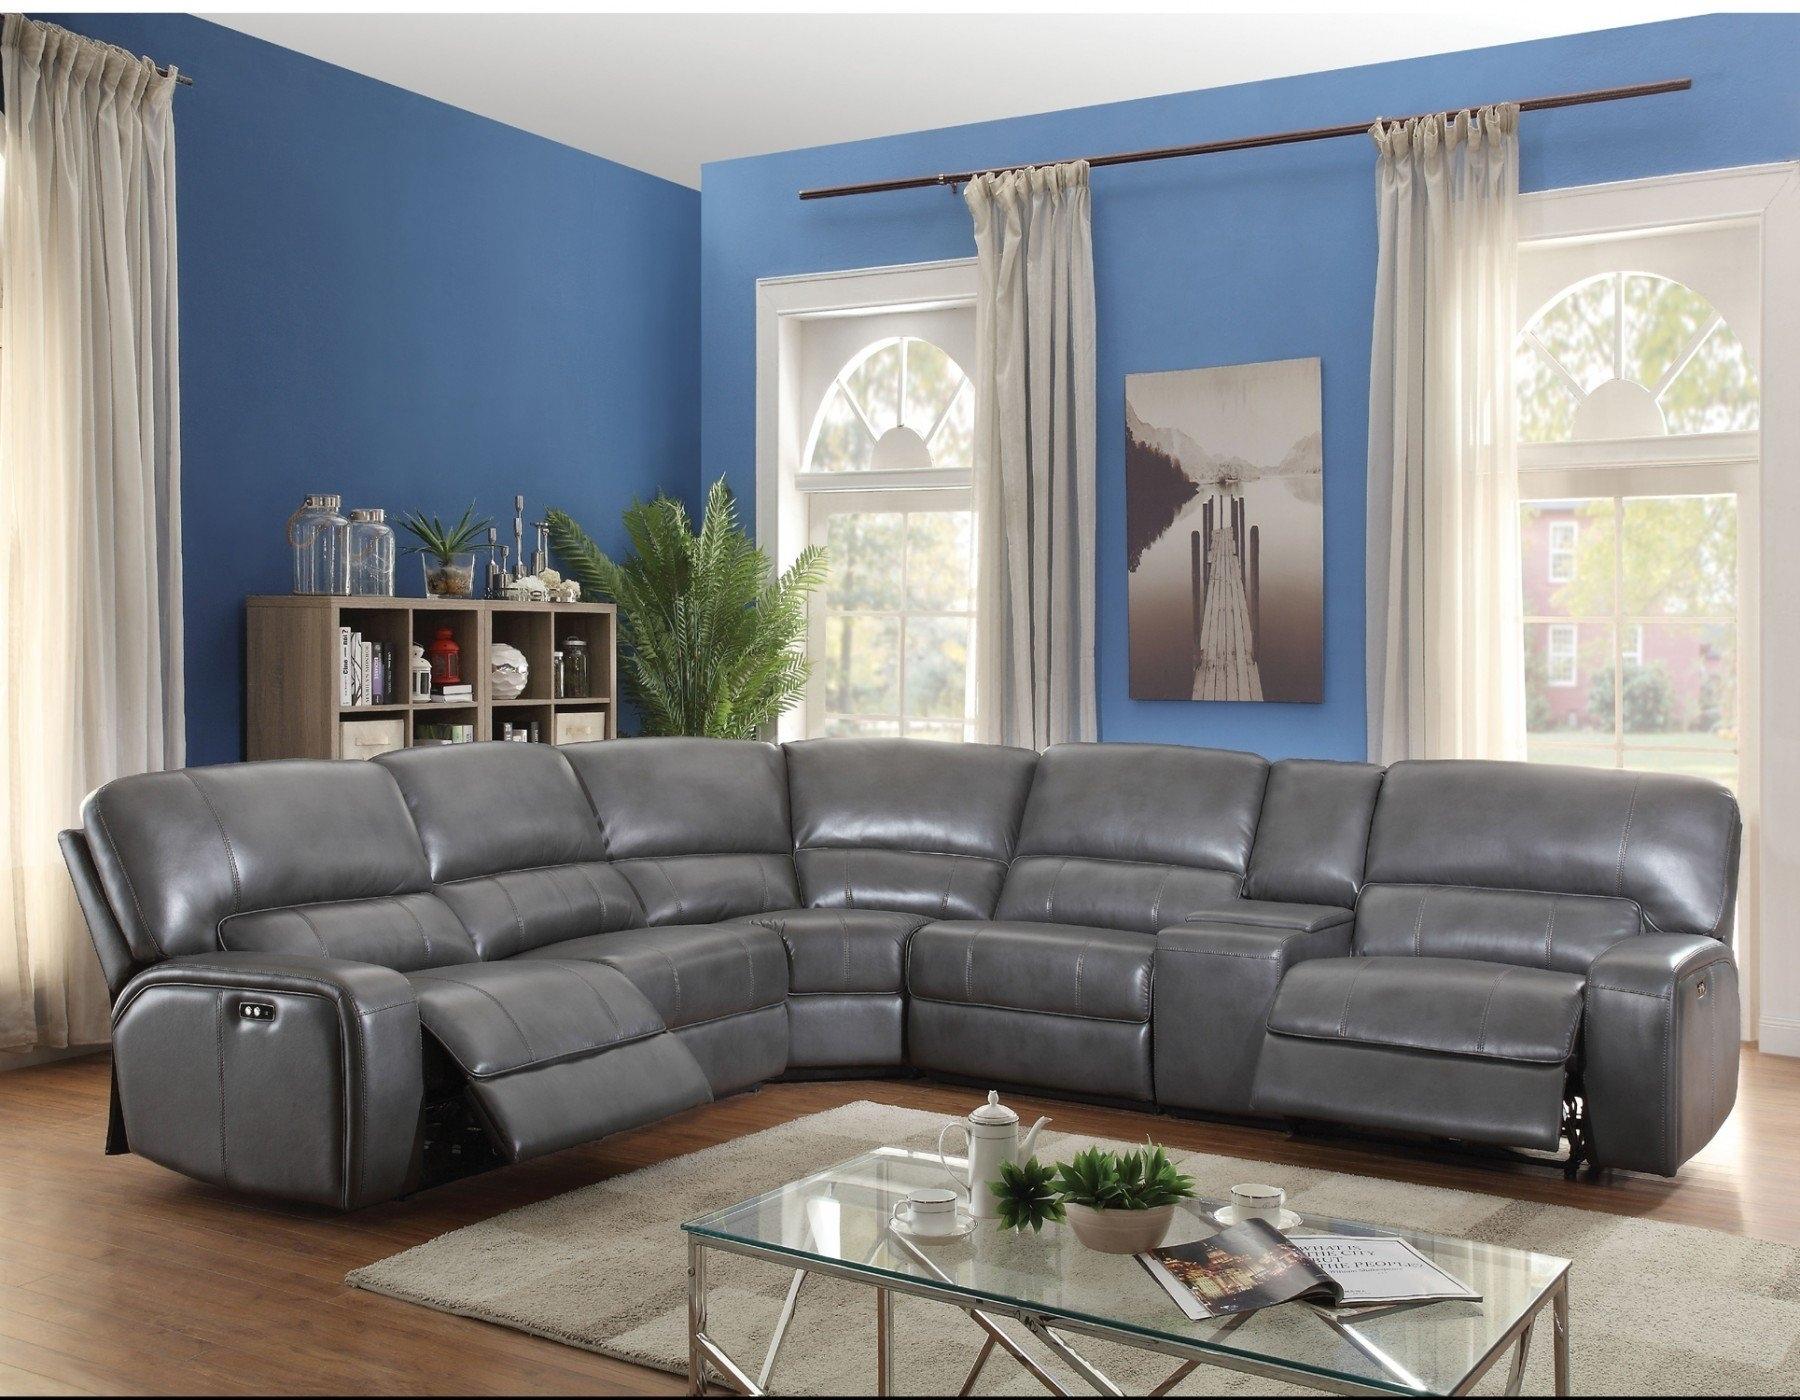 Furniture : Sectional Sofa Kijiji Edmonton Sectional Couch Under 700 For Kijiji Edmonton Sectional Sofas (Image 1 of 10)